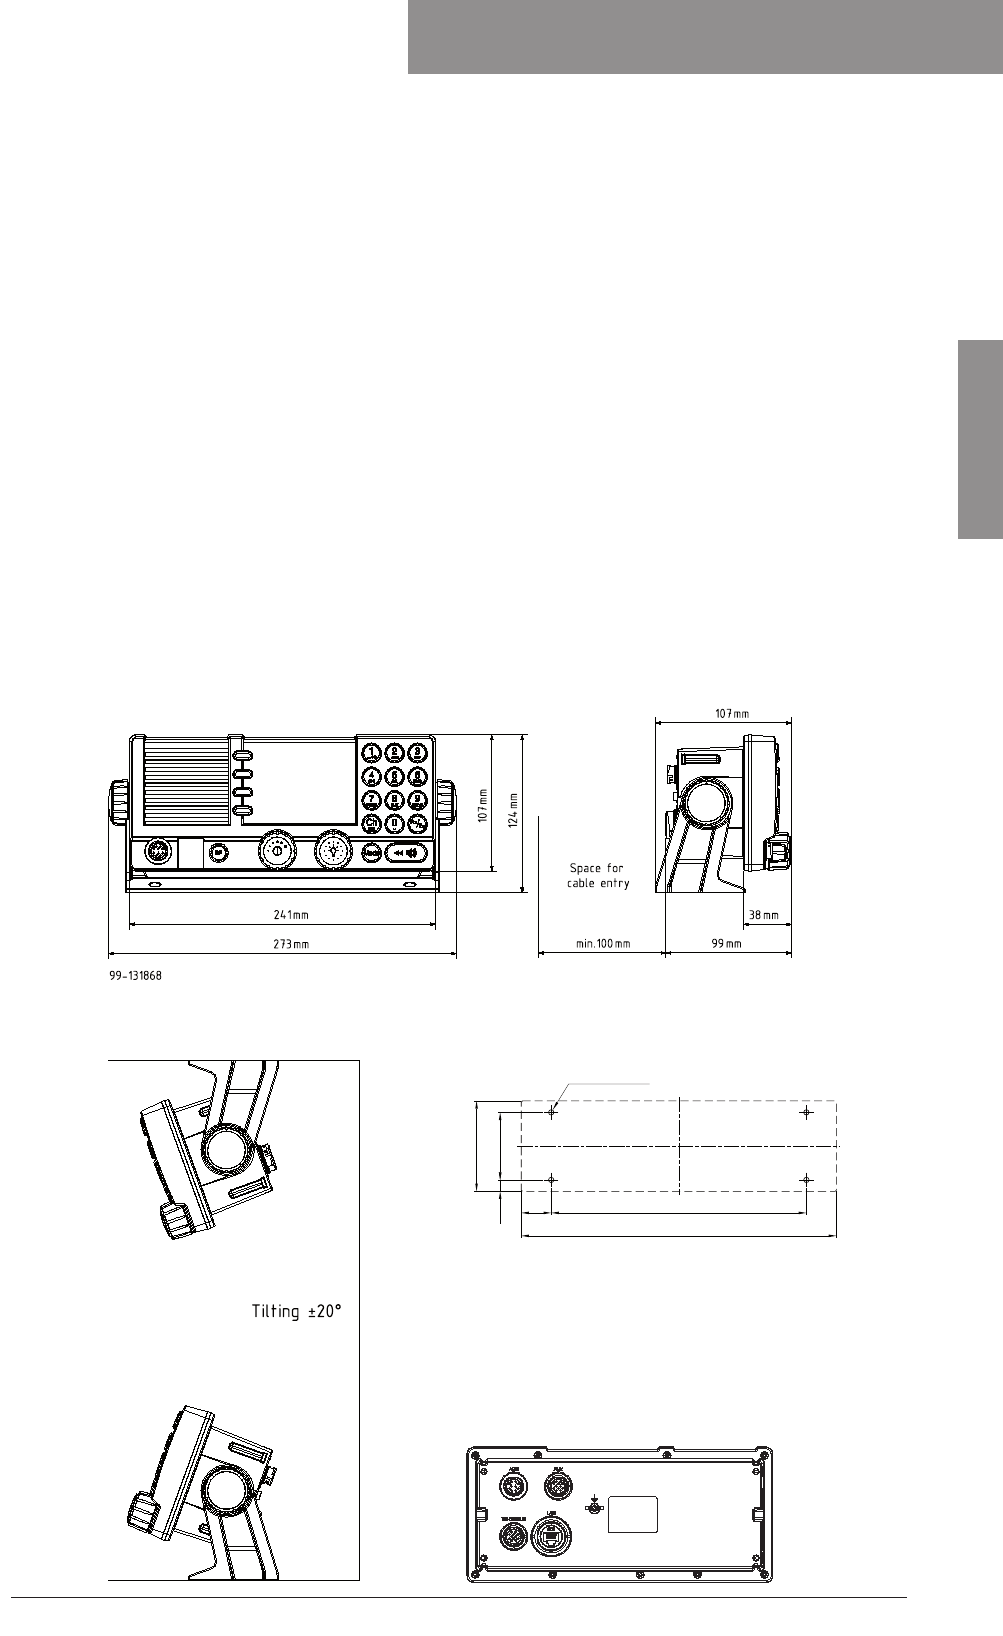 Thrane and Thrane A S 6300B Sailor 6366 TU MF/HF 150W DSC